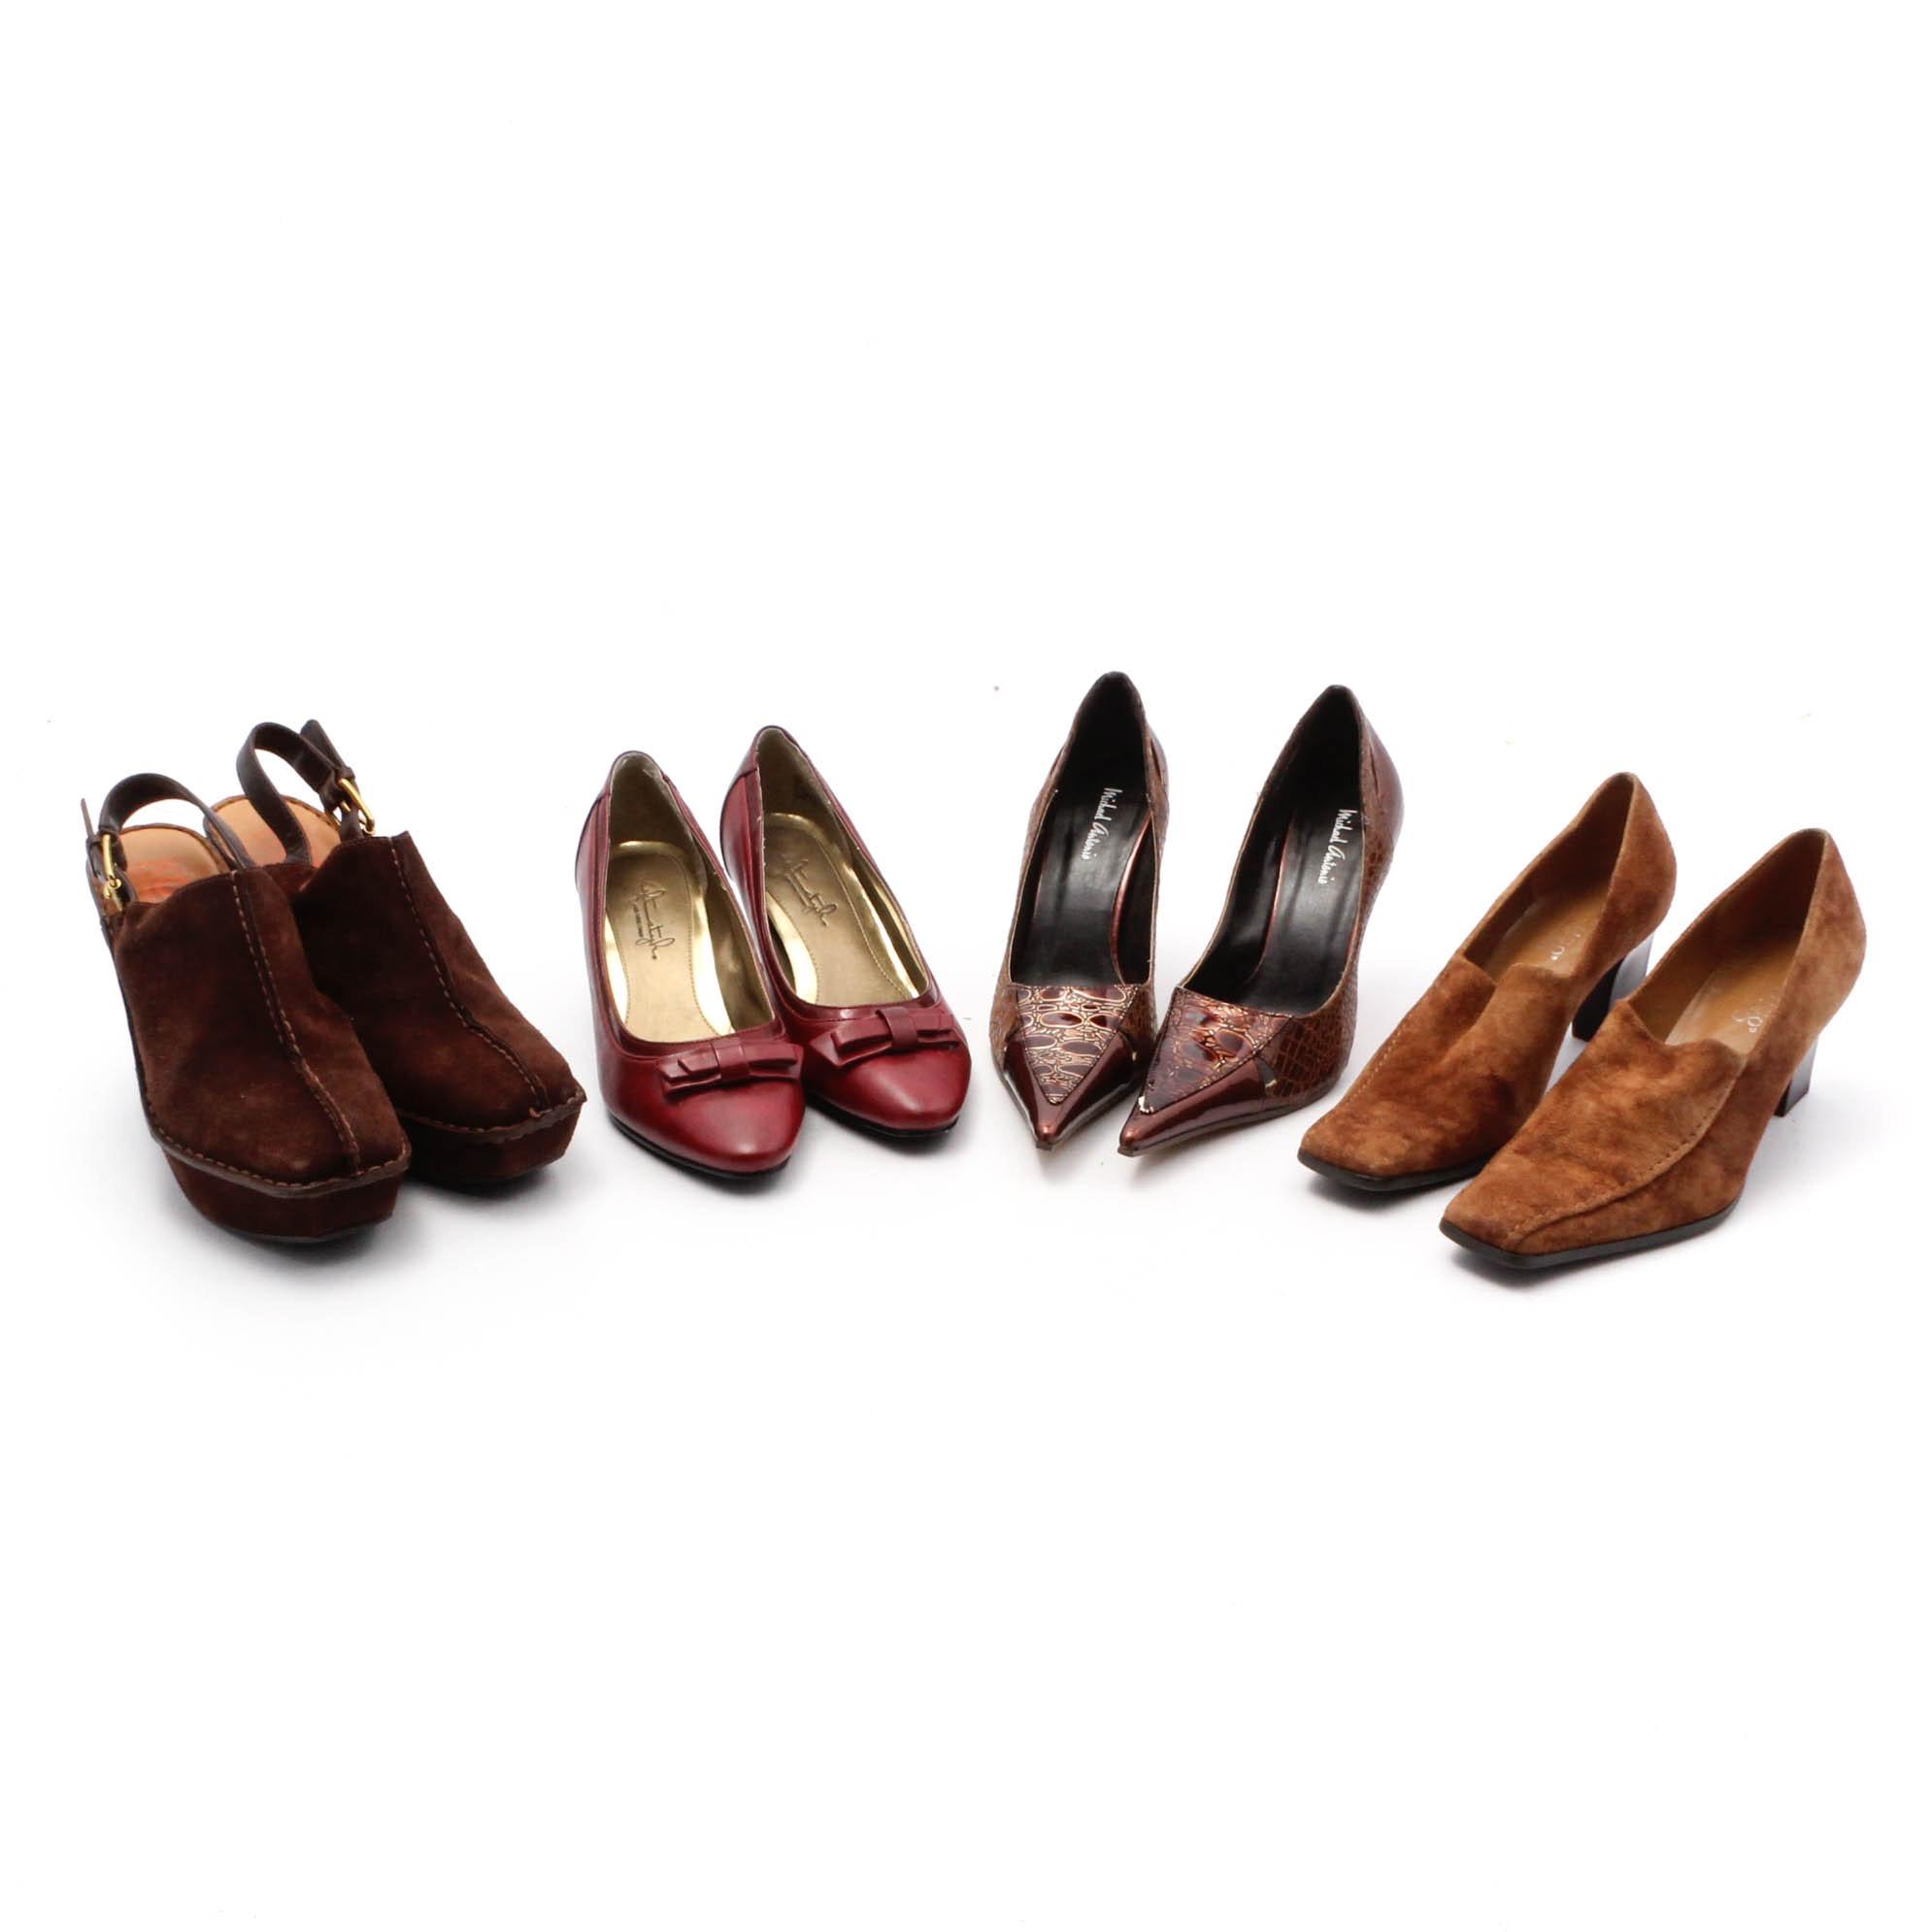 Women's Heeled Shoes including KORS Michael Kors, Franco Sarto